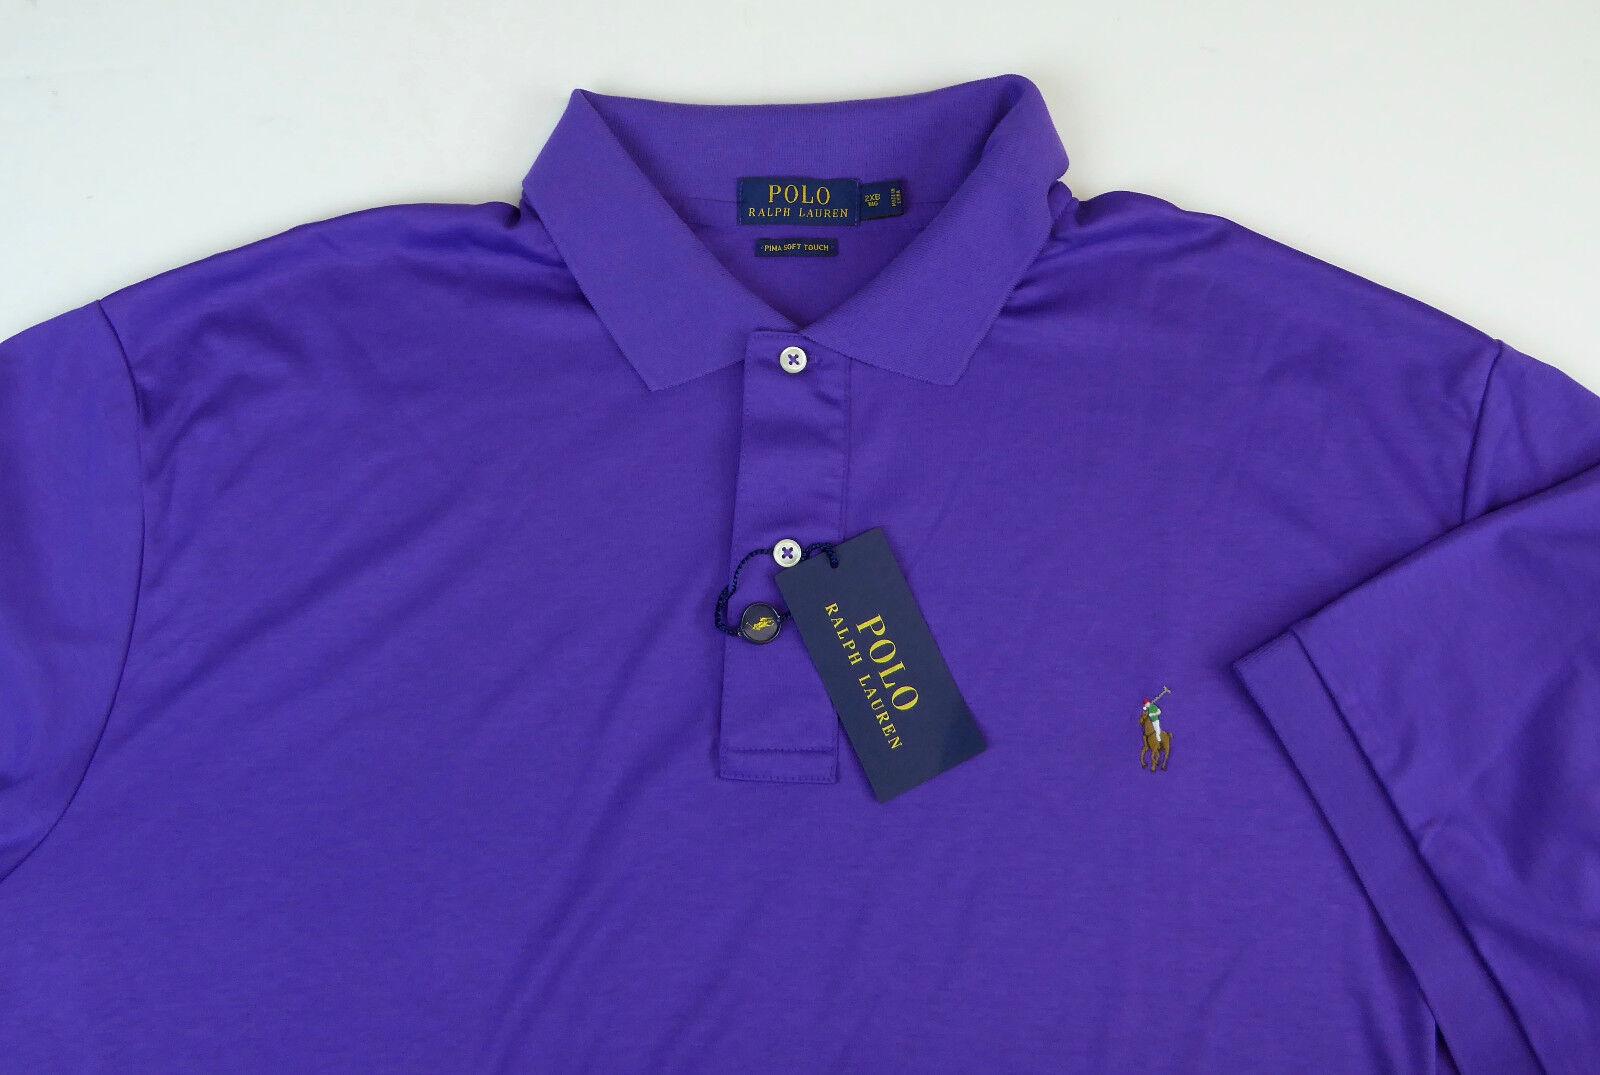 9b028d60 Polo Ralph Lauren Pima Soft Touch Shirt Vista Purple Cotton Mens ...